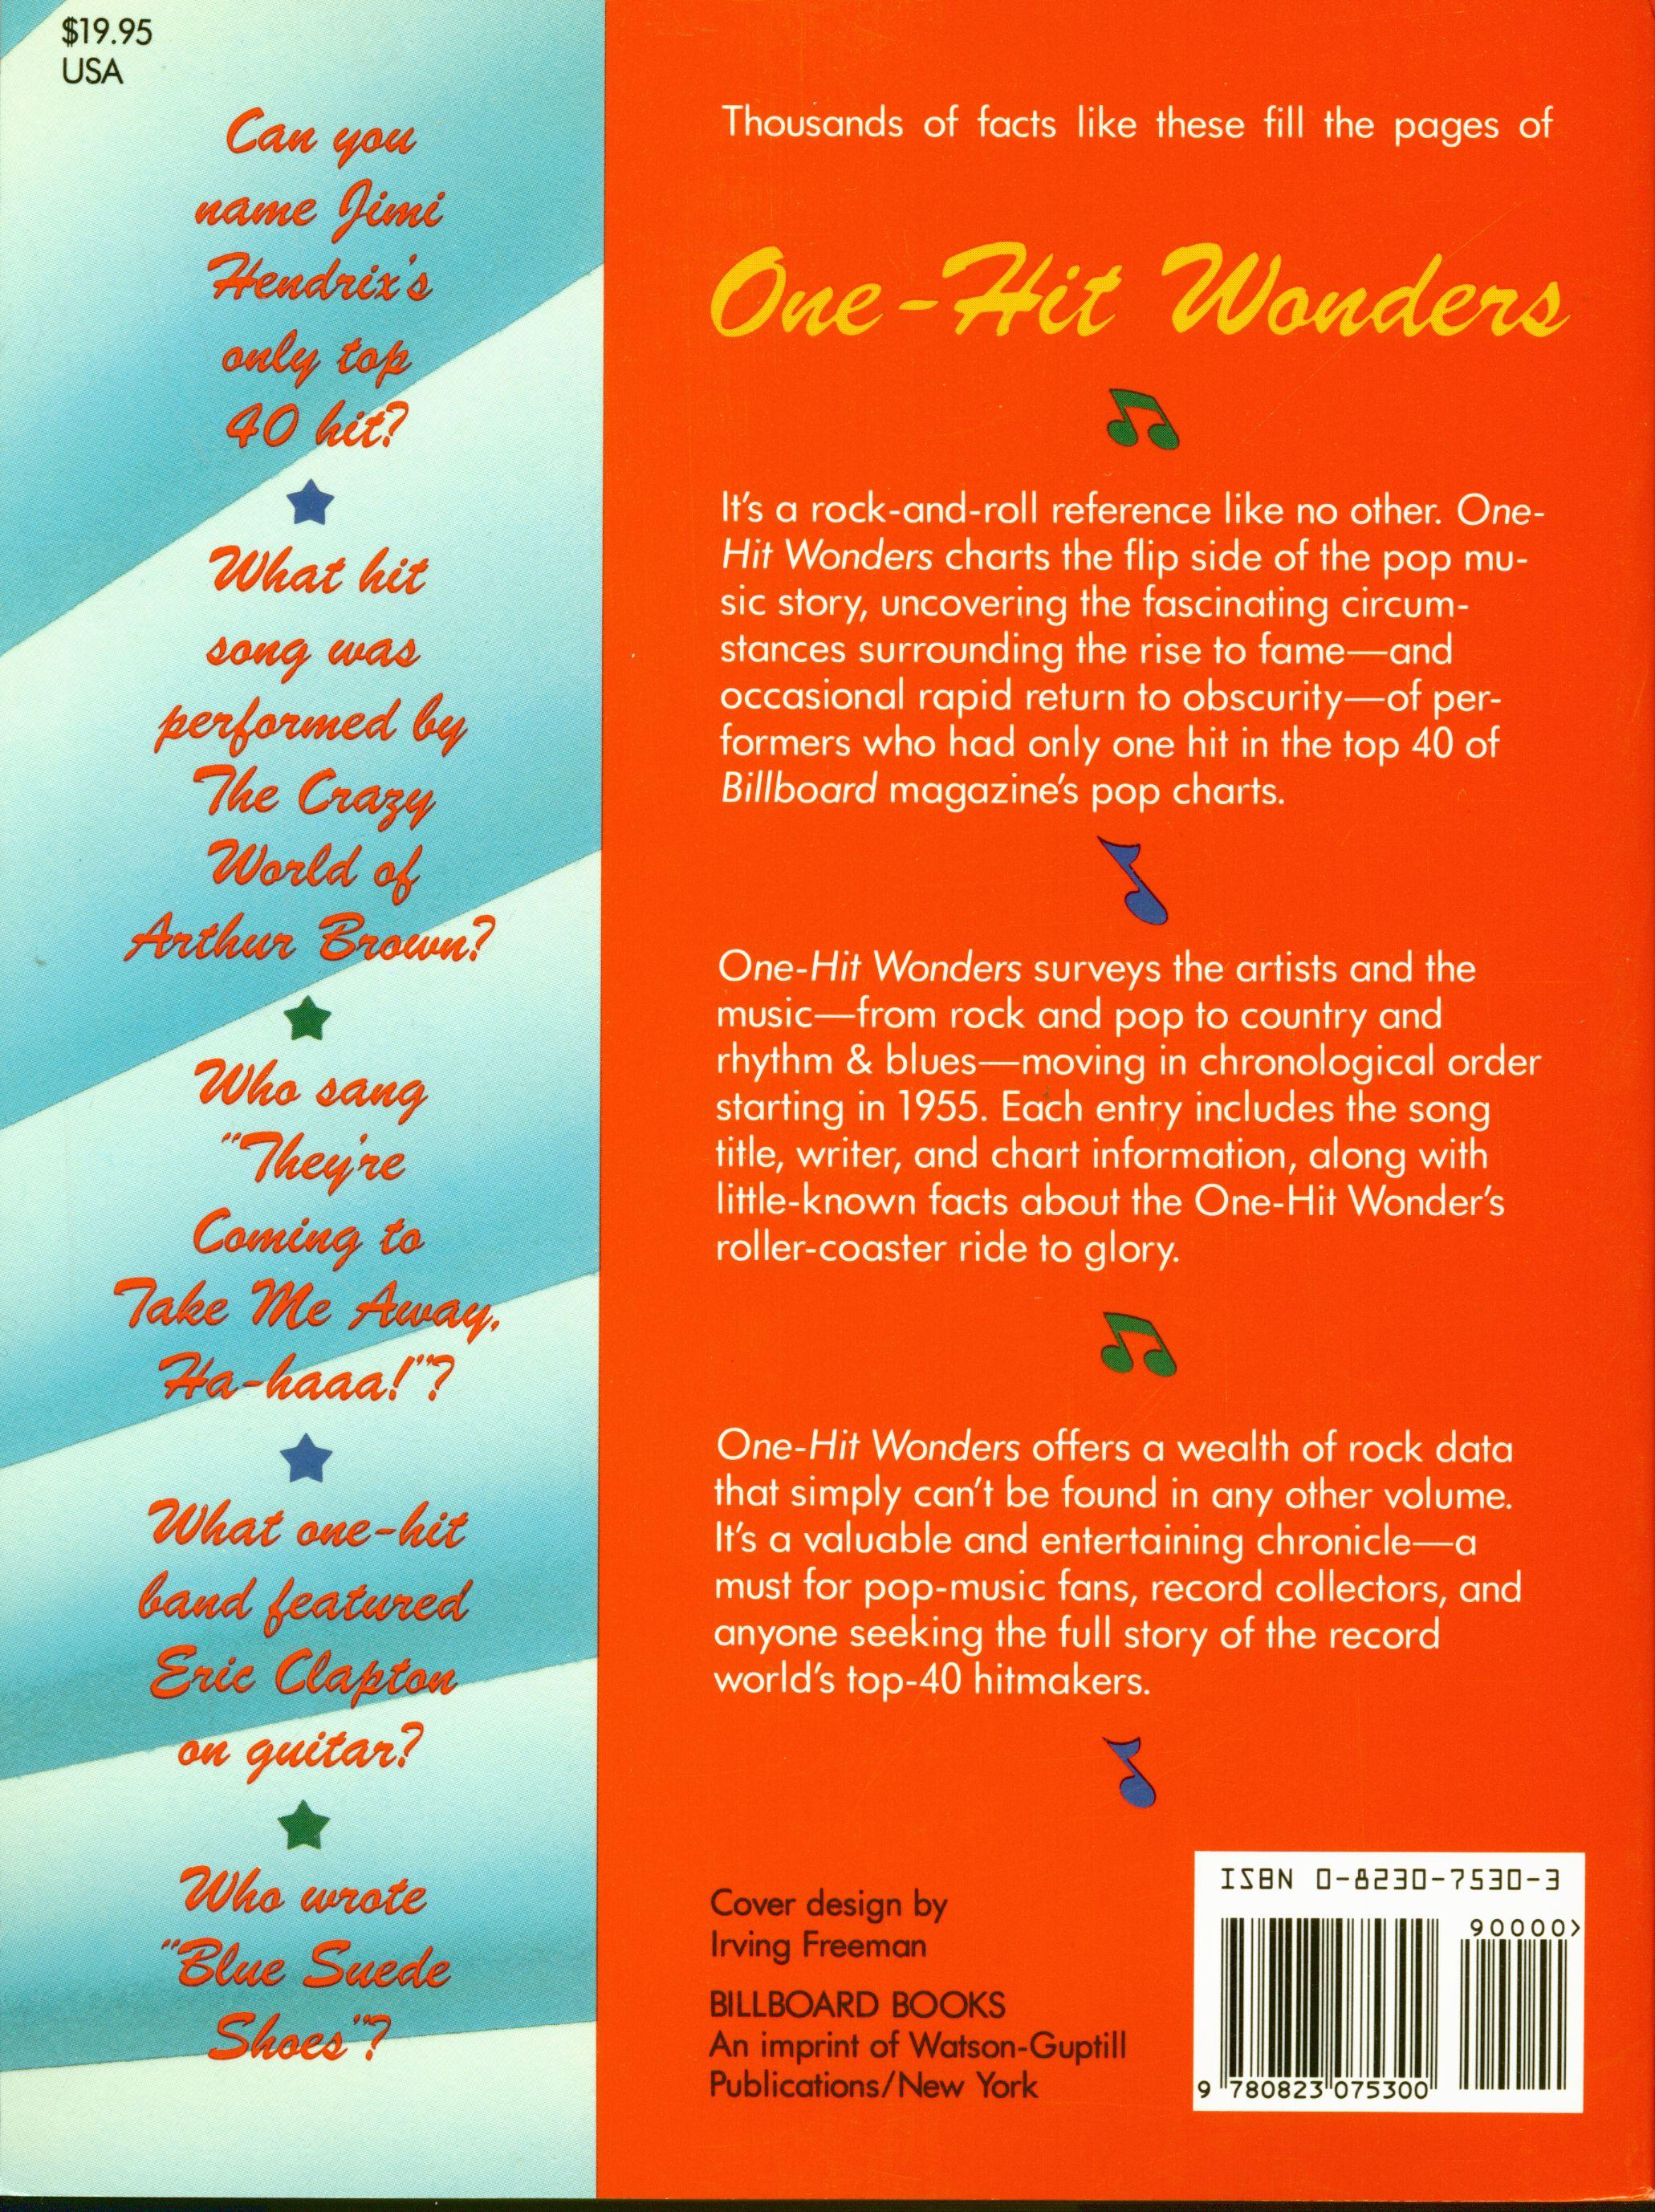 One Hit Wonders Bucher Books The Billboard Book Of One Hit Wonders